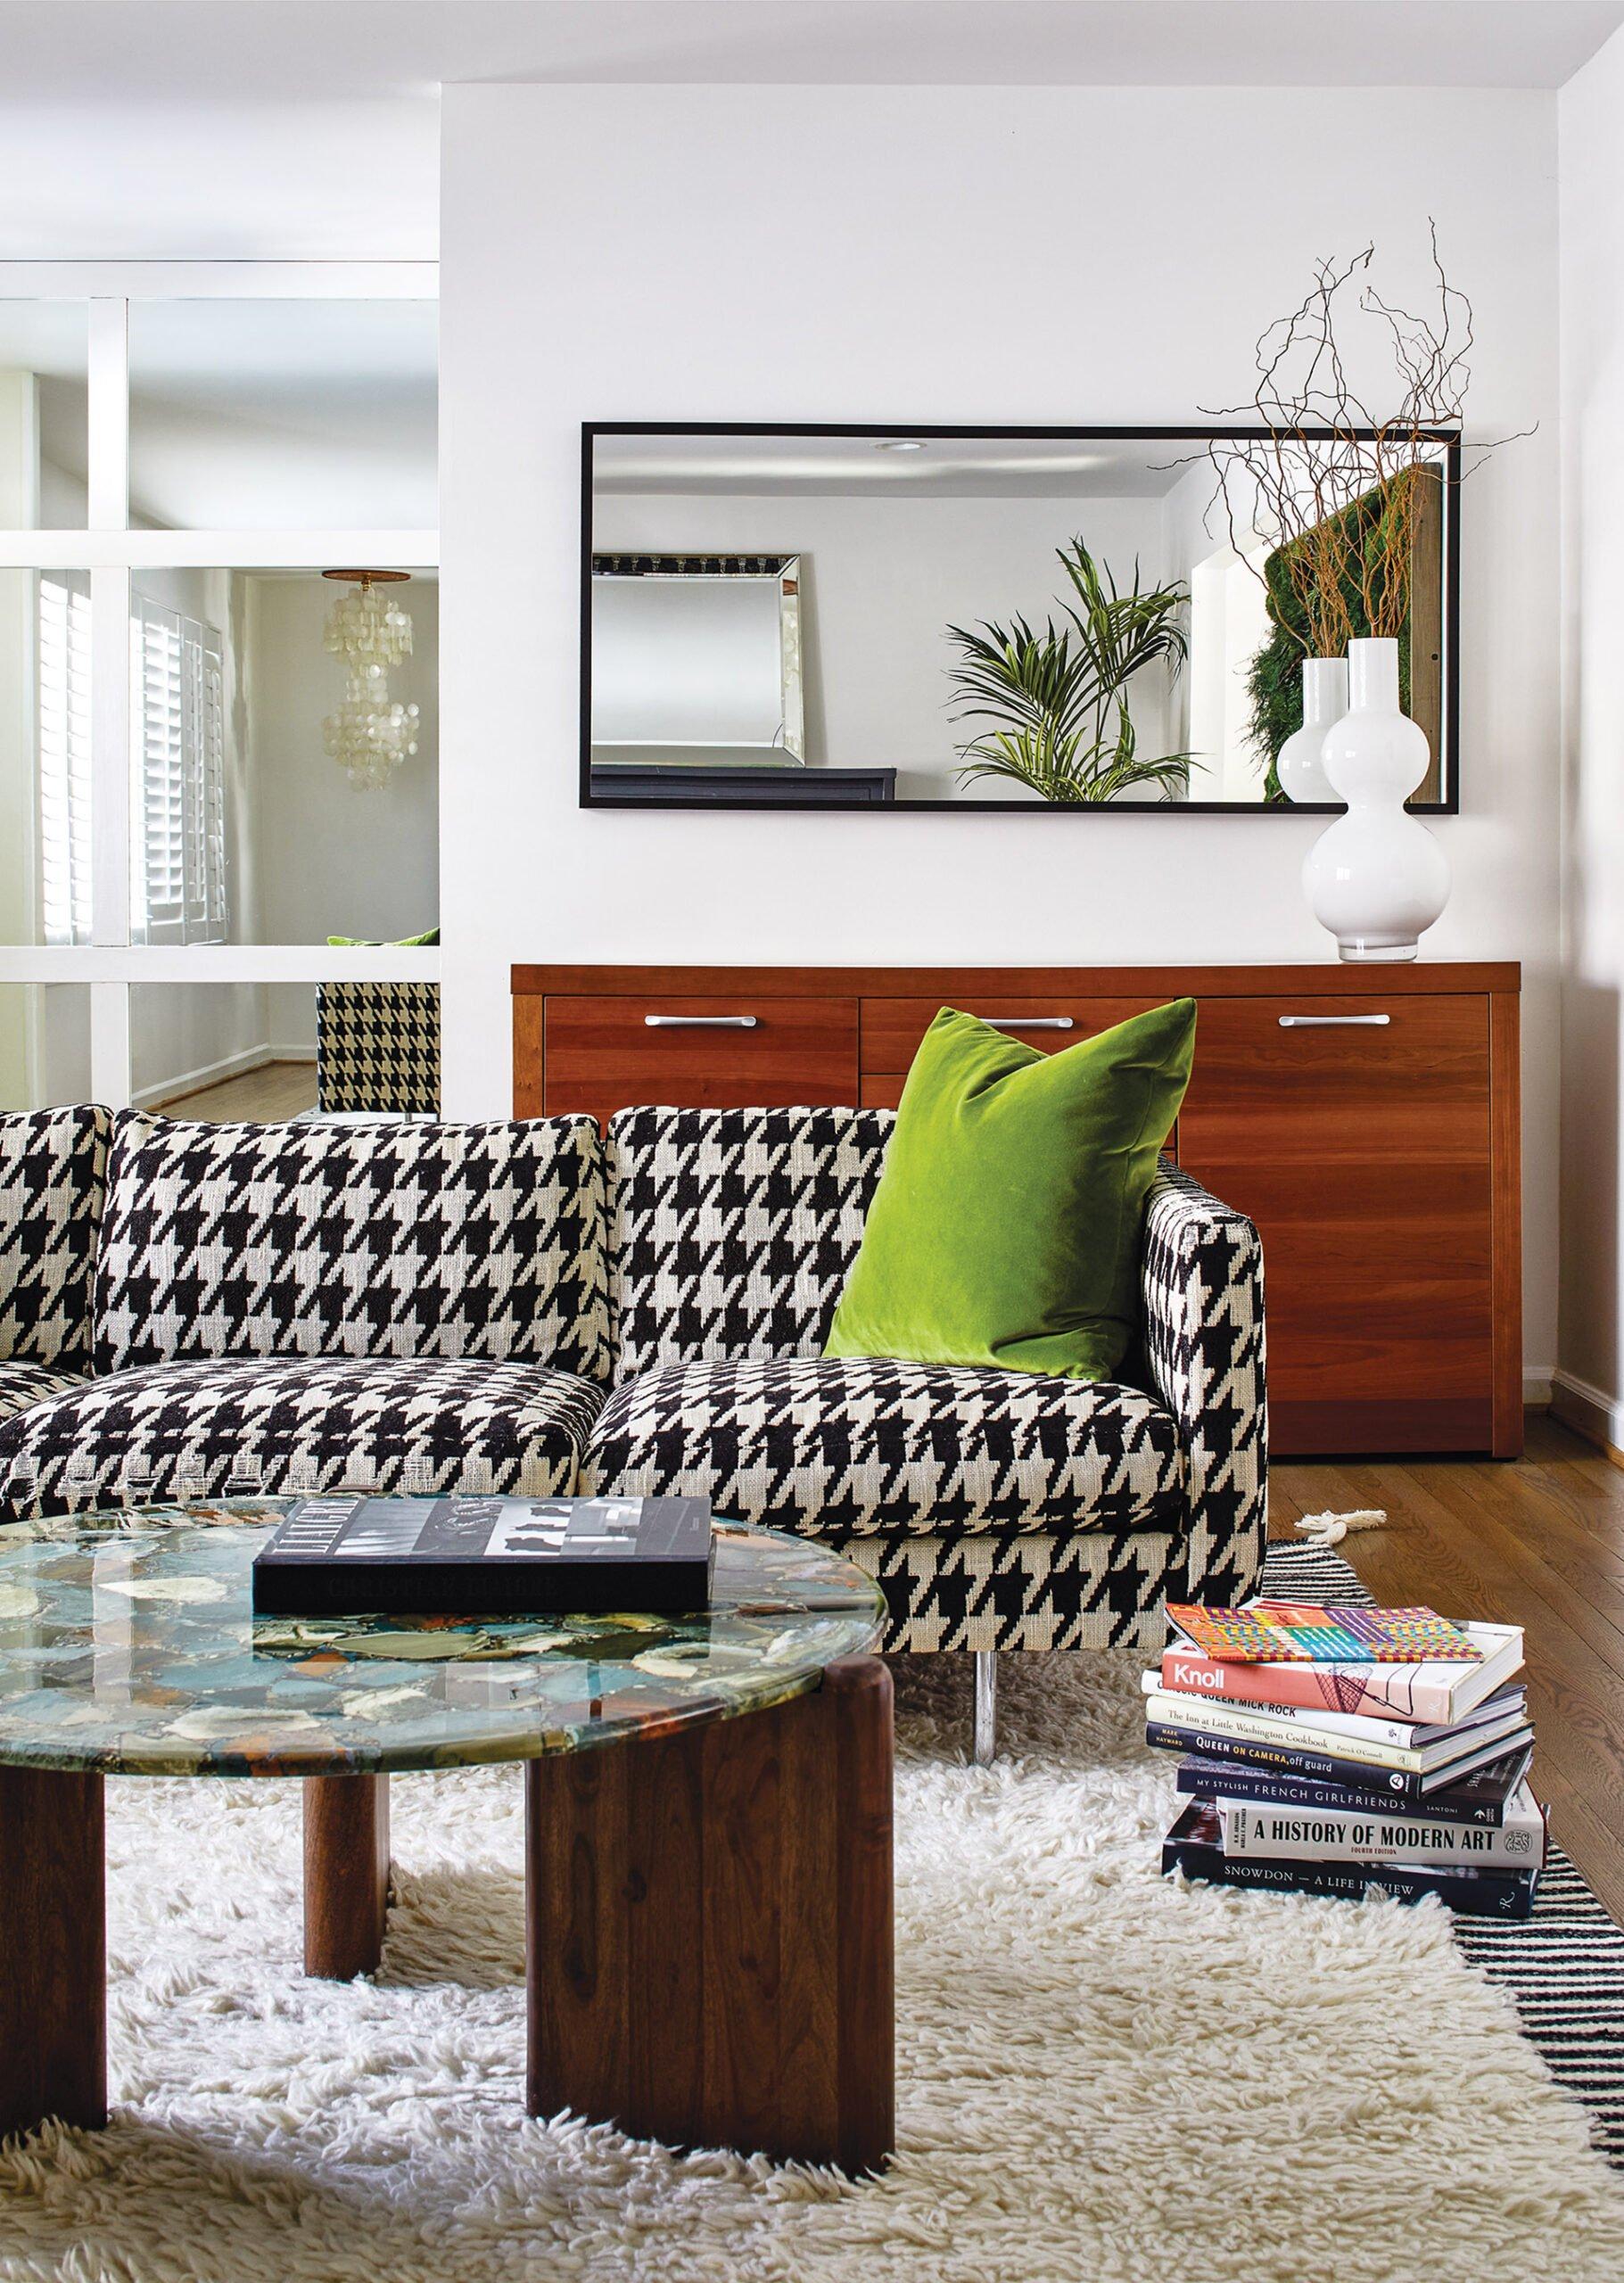 Original Milo Baughman sofa in living room.